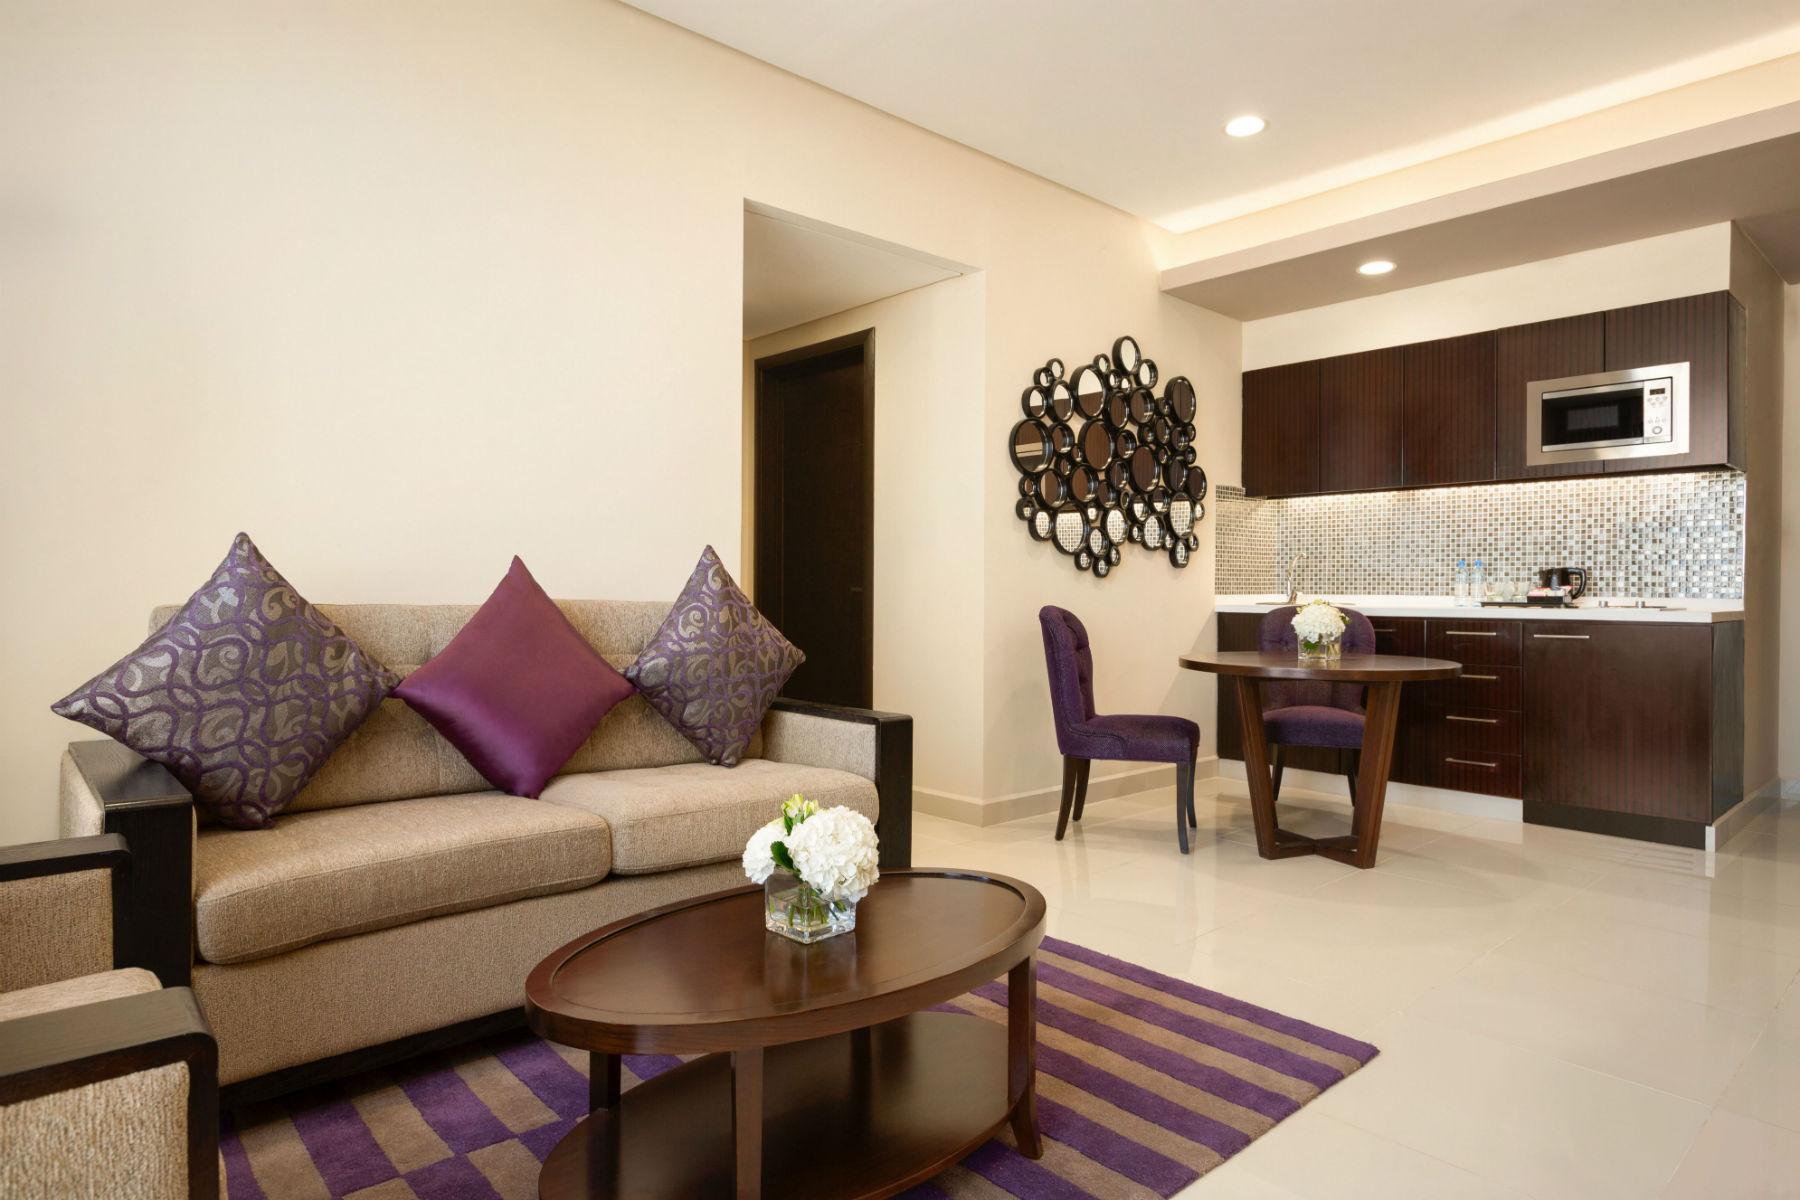 One Bedroom Suite in Bahrain | Wyndham Garden Hotel Manama